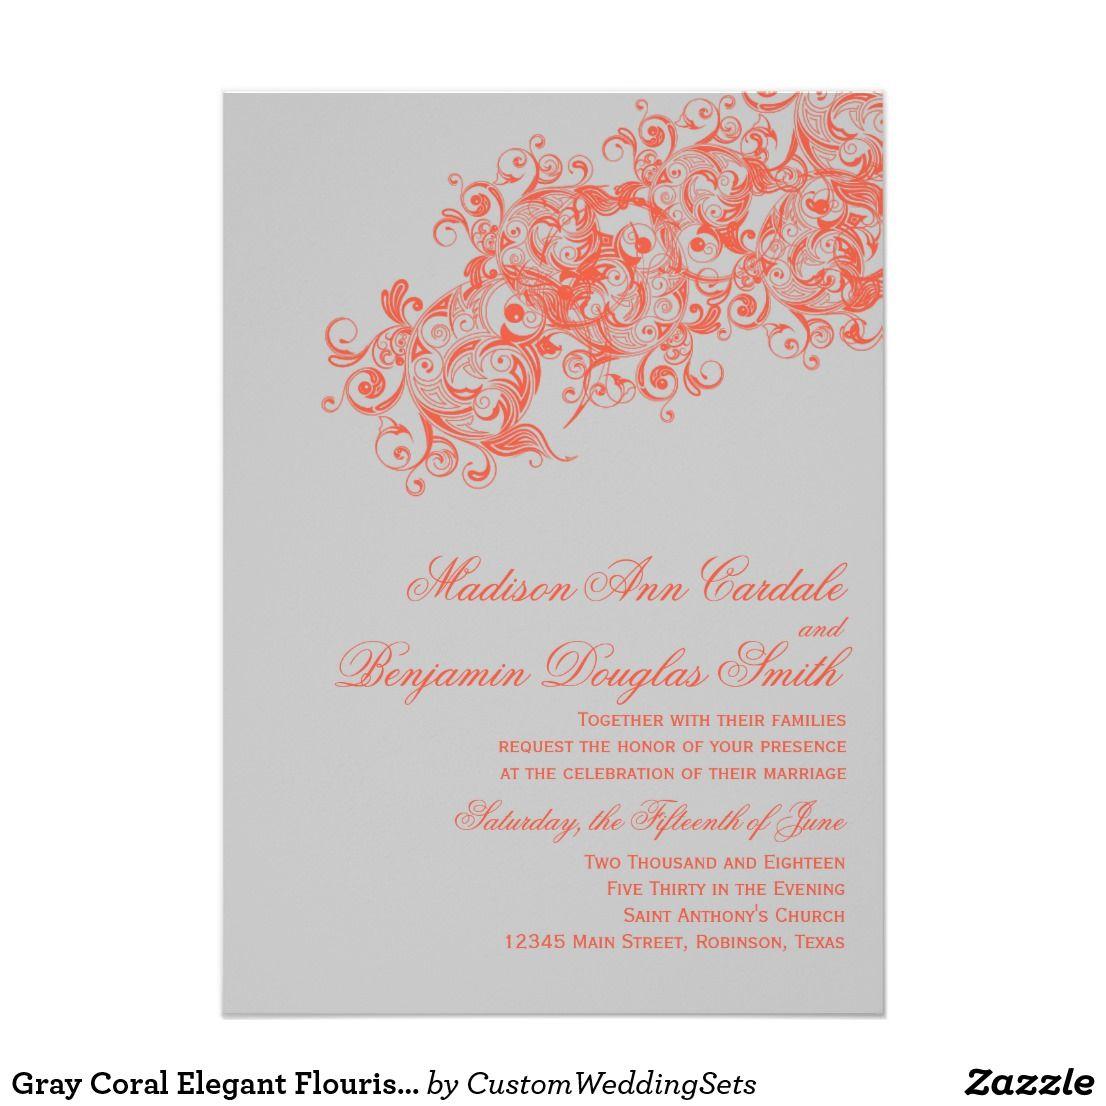 Gray Coral Elegant Flourish Wedding Invitations | Flourish, Elegant ...